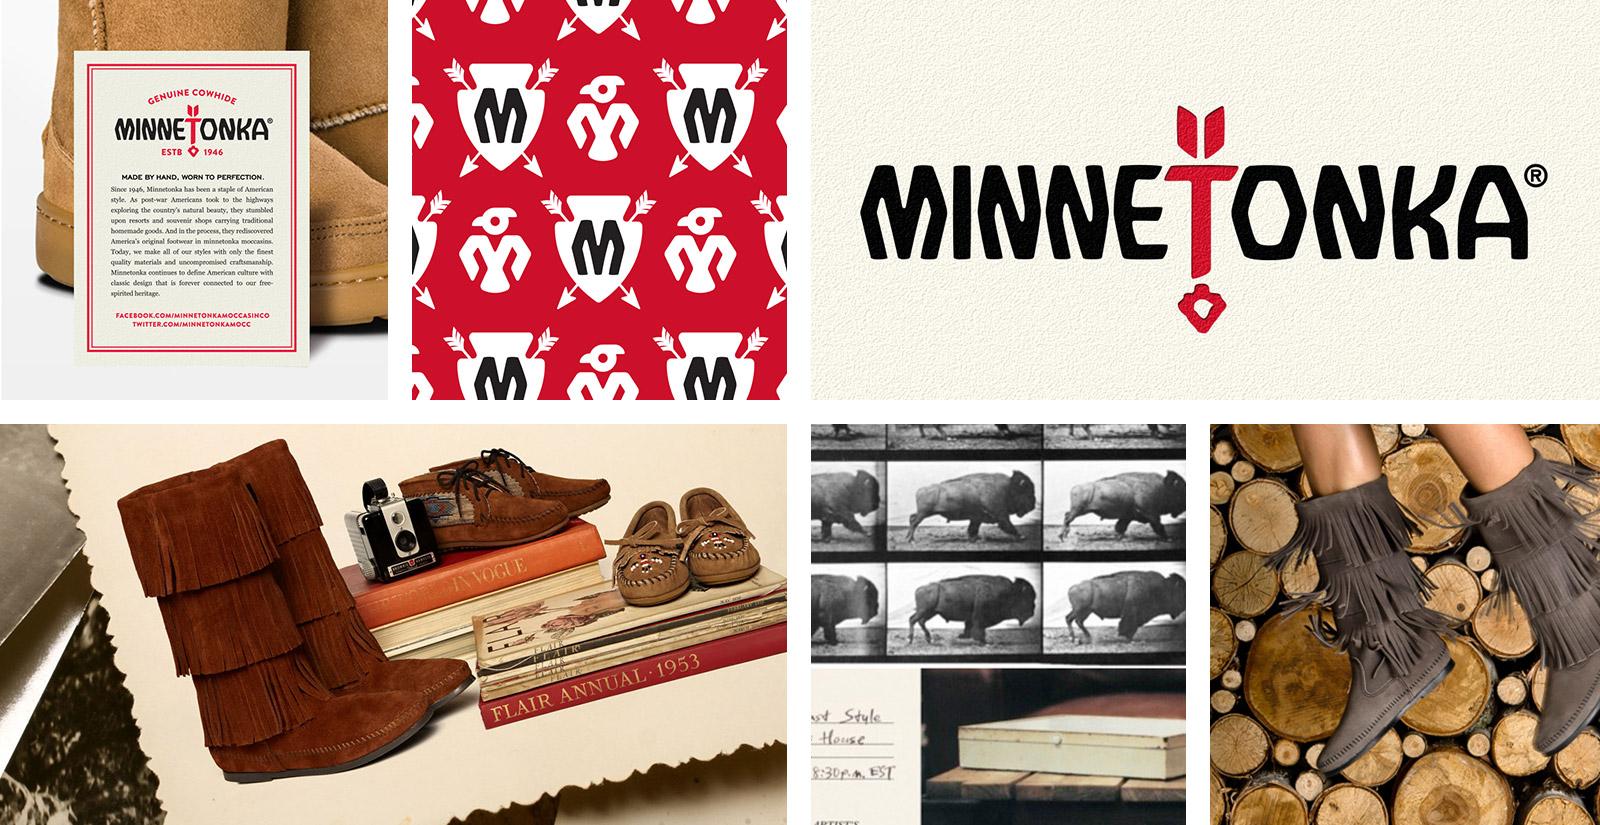 Wink Minneapolis